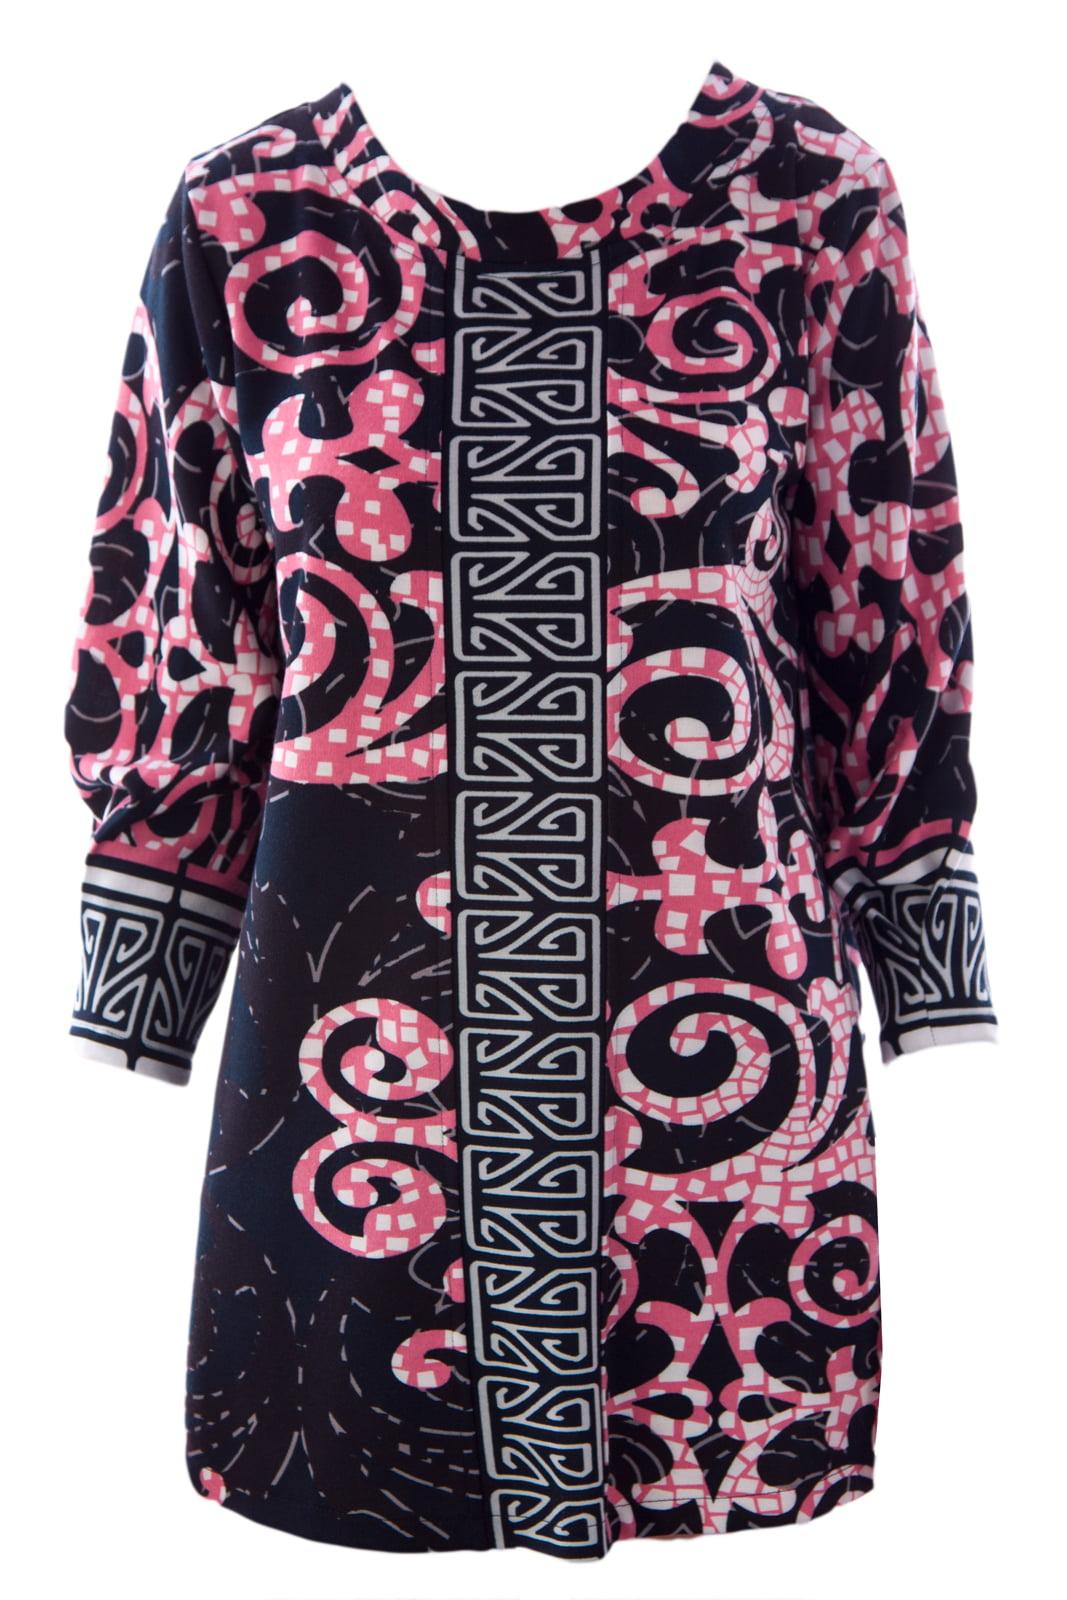 Olian Women's 3/4 Sleeve Printed Maternity Tunic X-Small Black & Pink